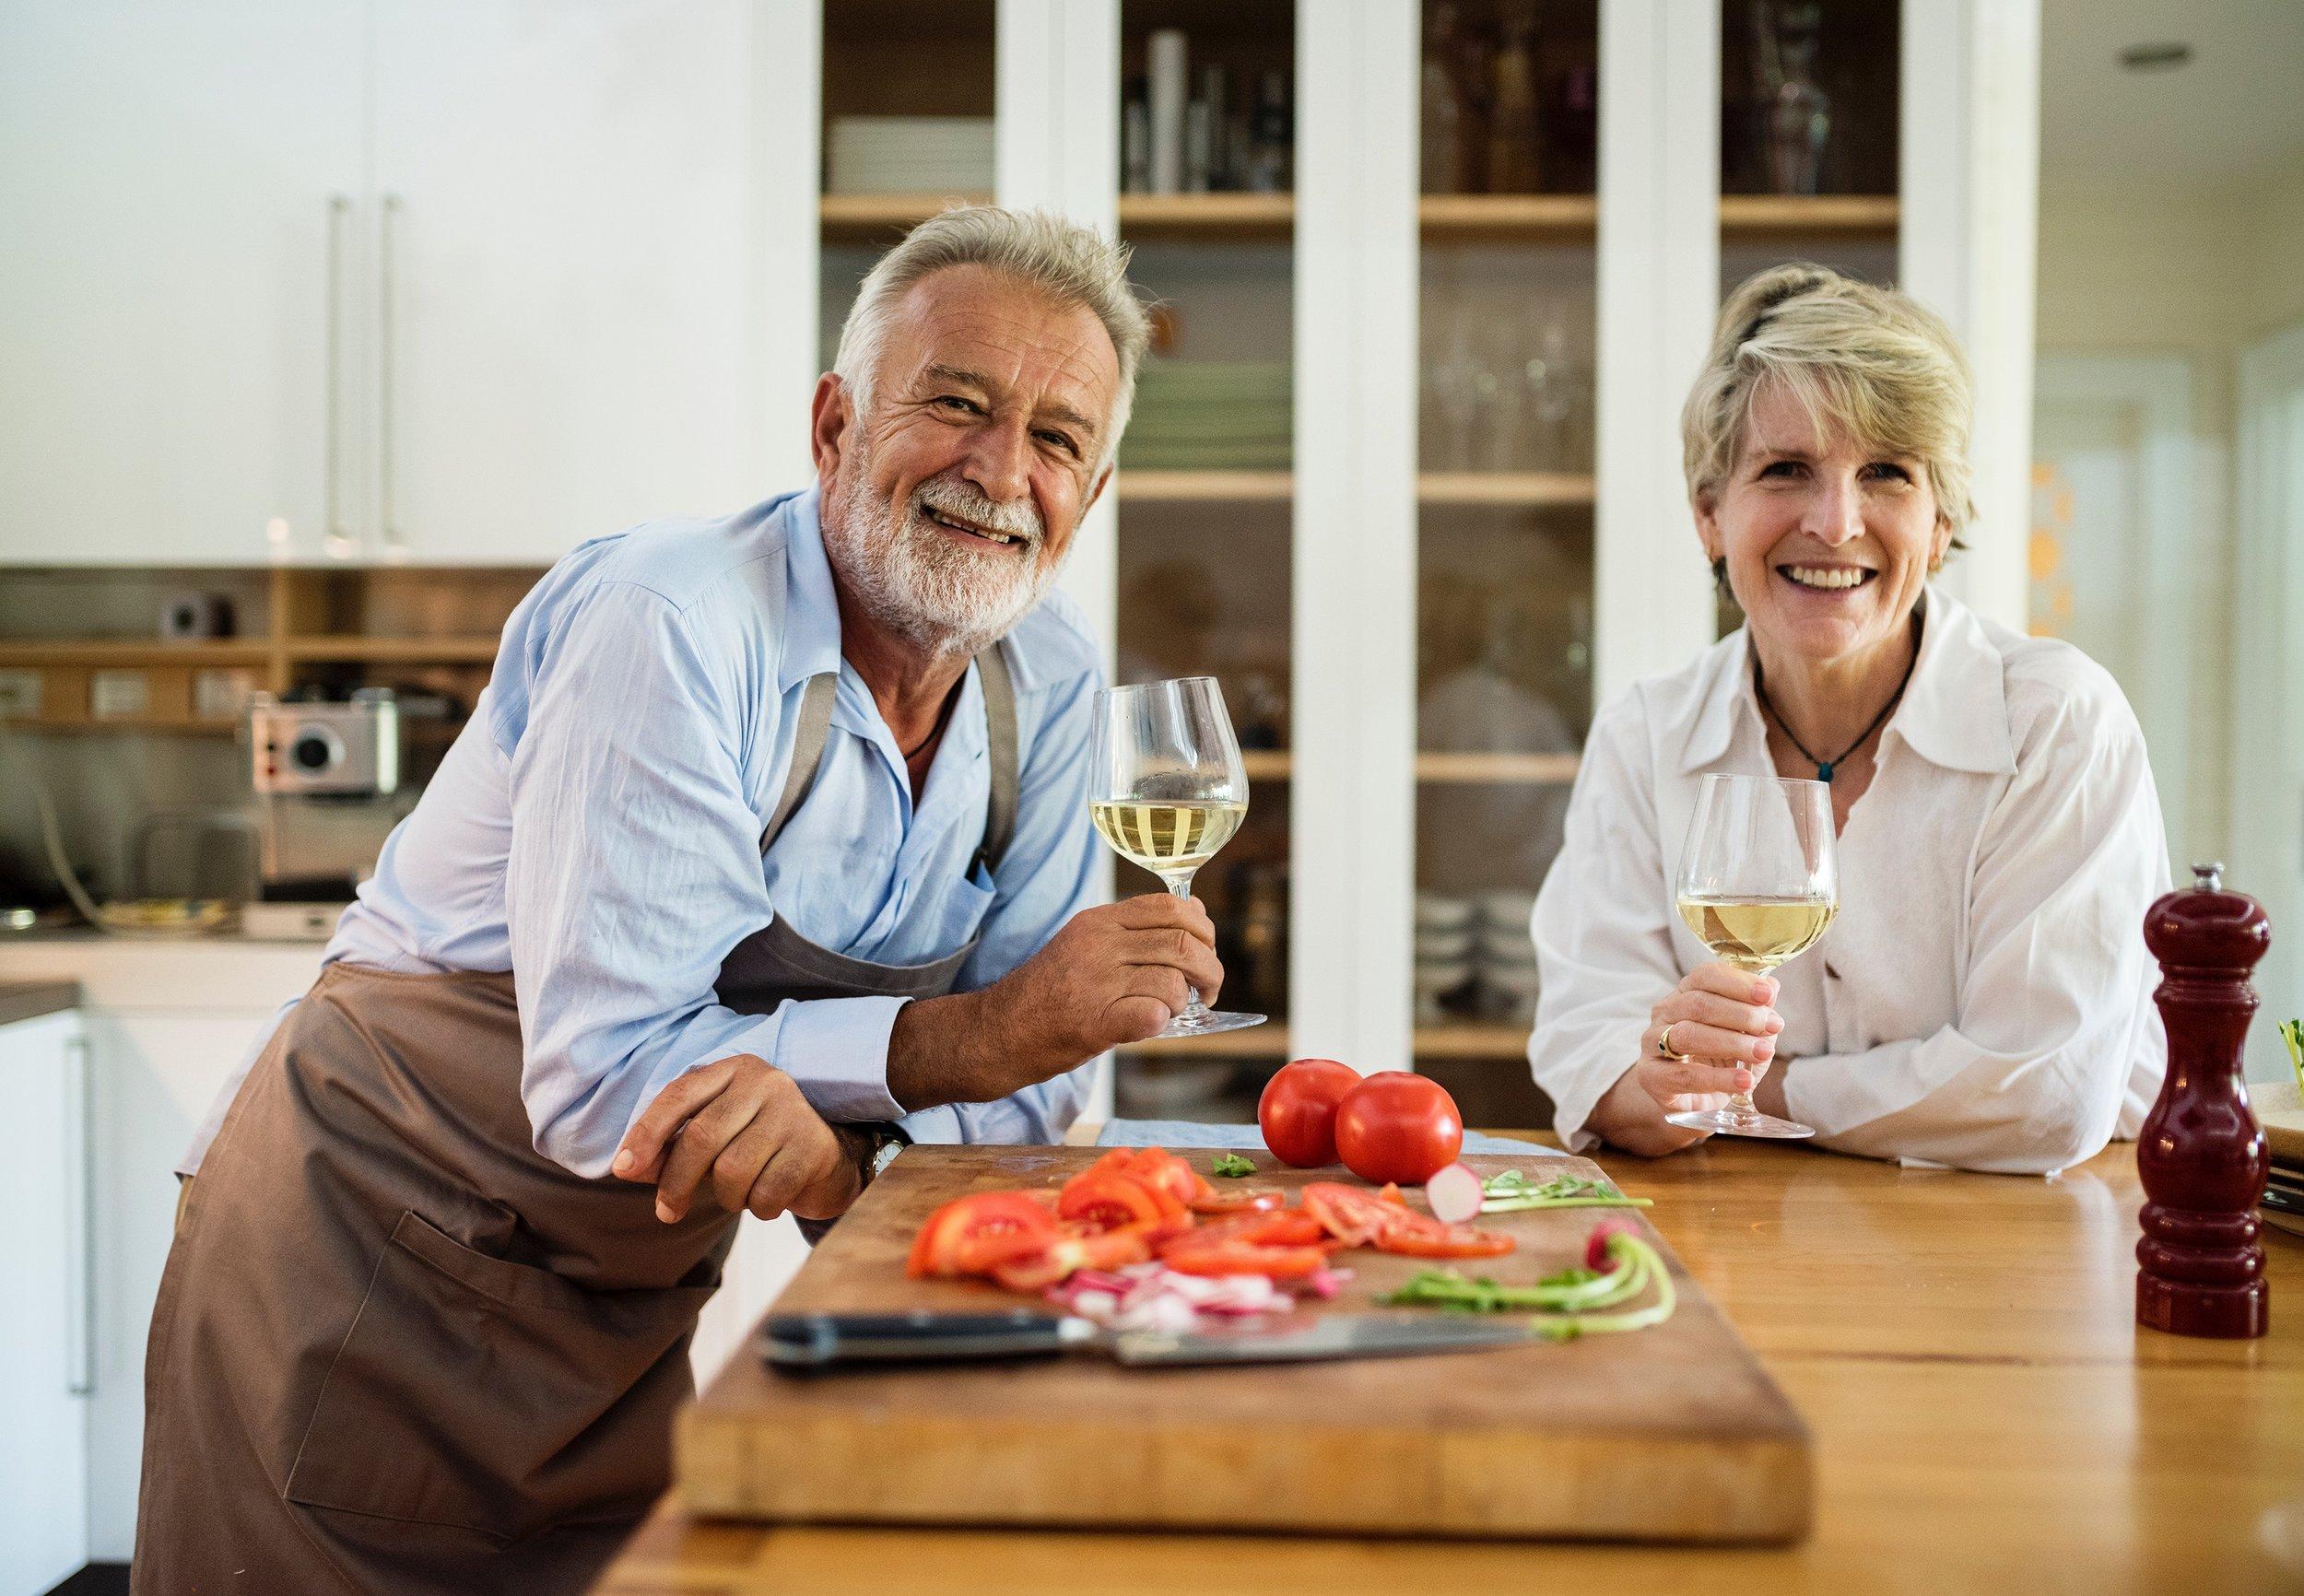 Retirement - You Have Big Plans